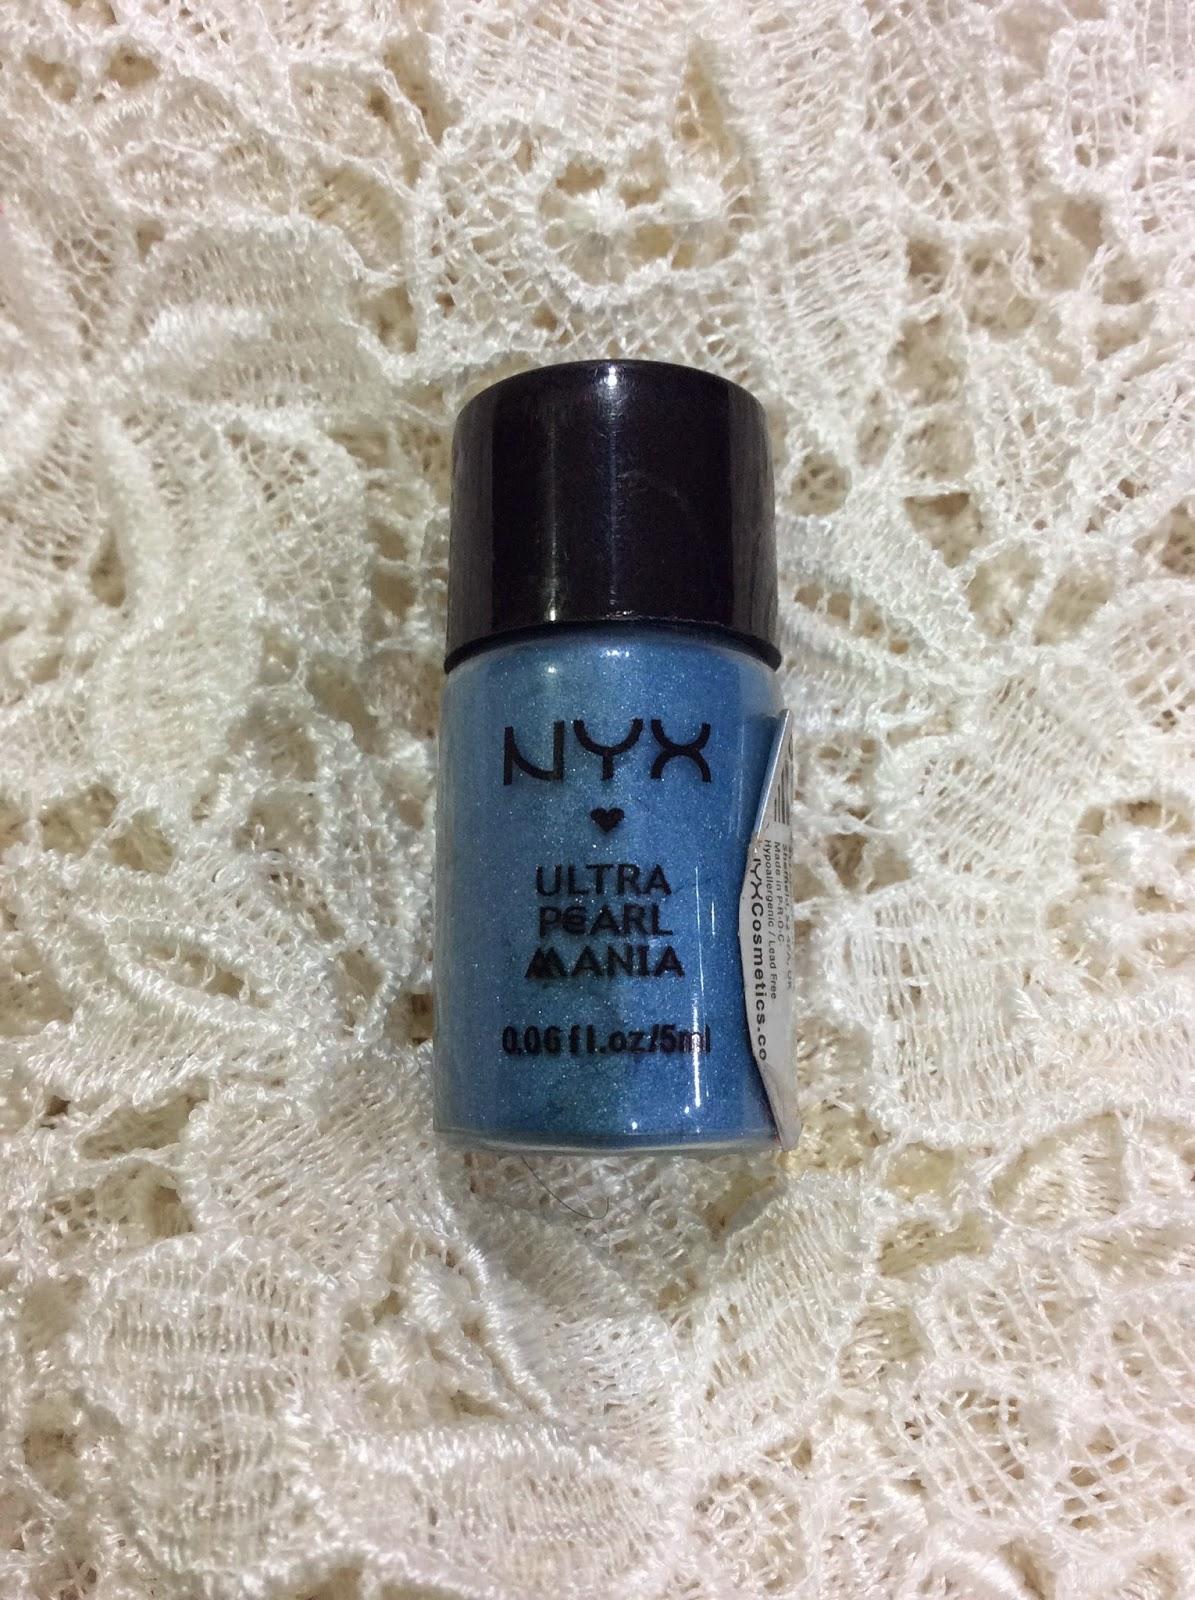 Blog Sale - NYX Pearl Mania in Ocean Blue Pearl